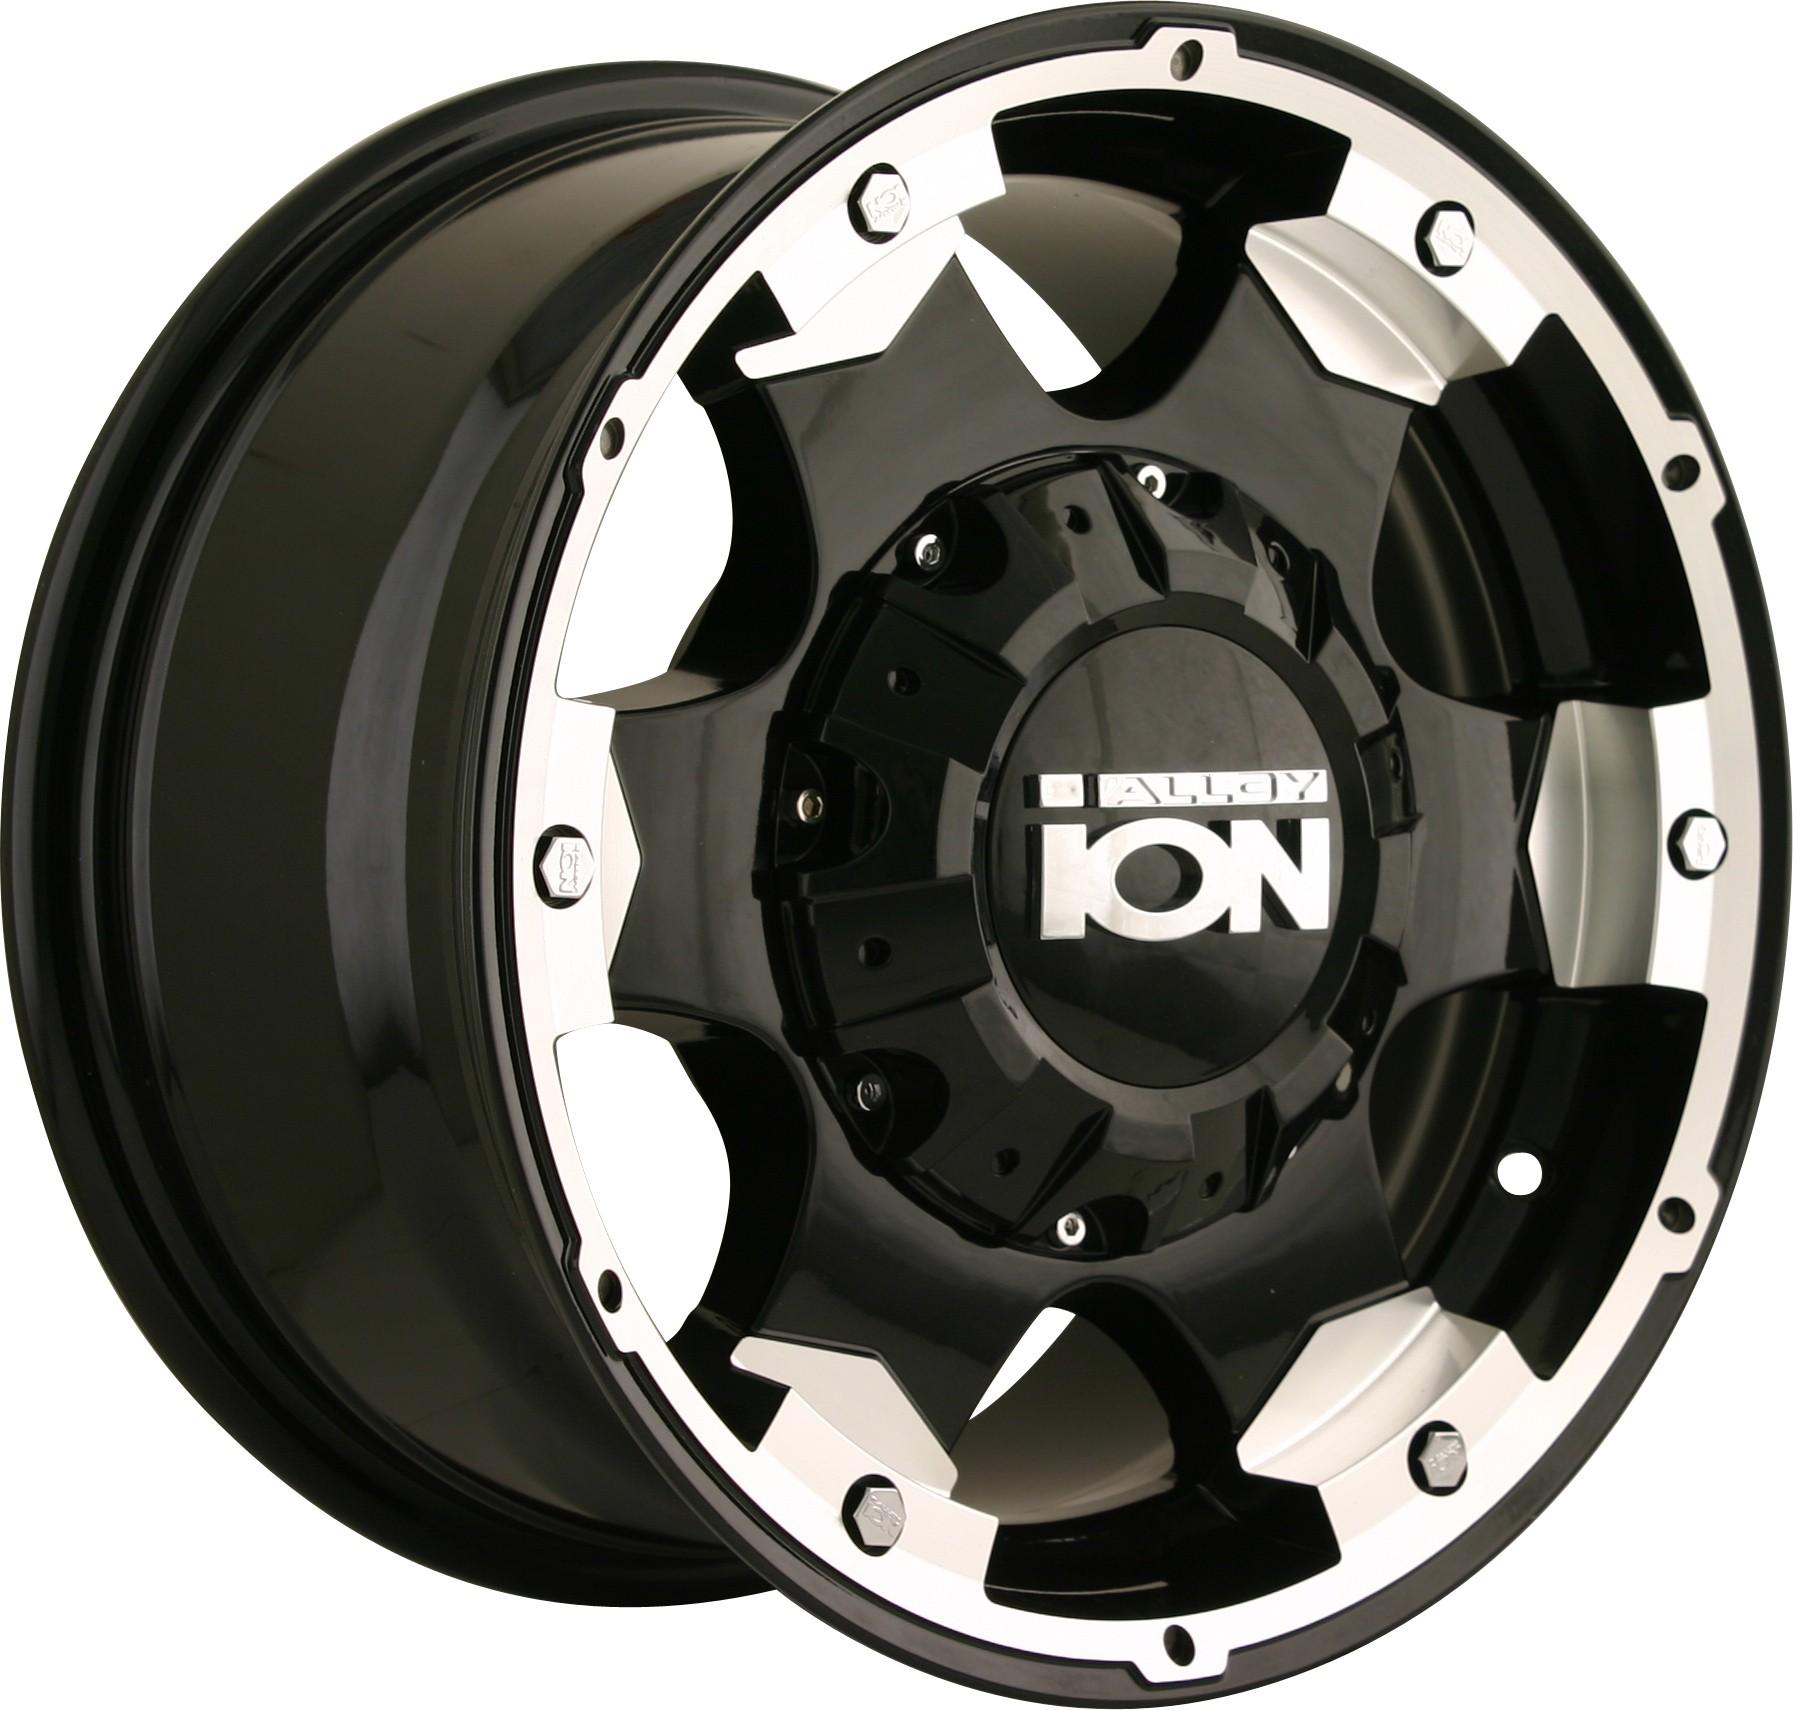 "Ion 194 - 15""x8"" - 5x127/5x114.3 - Black"